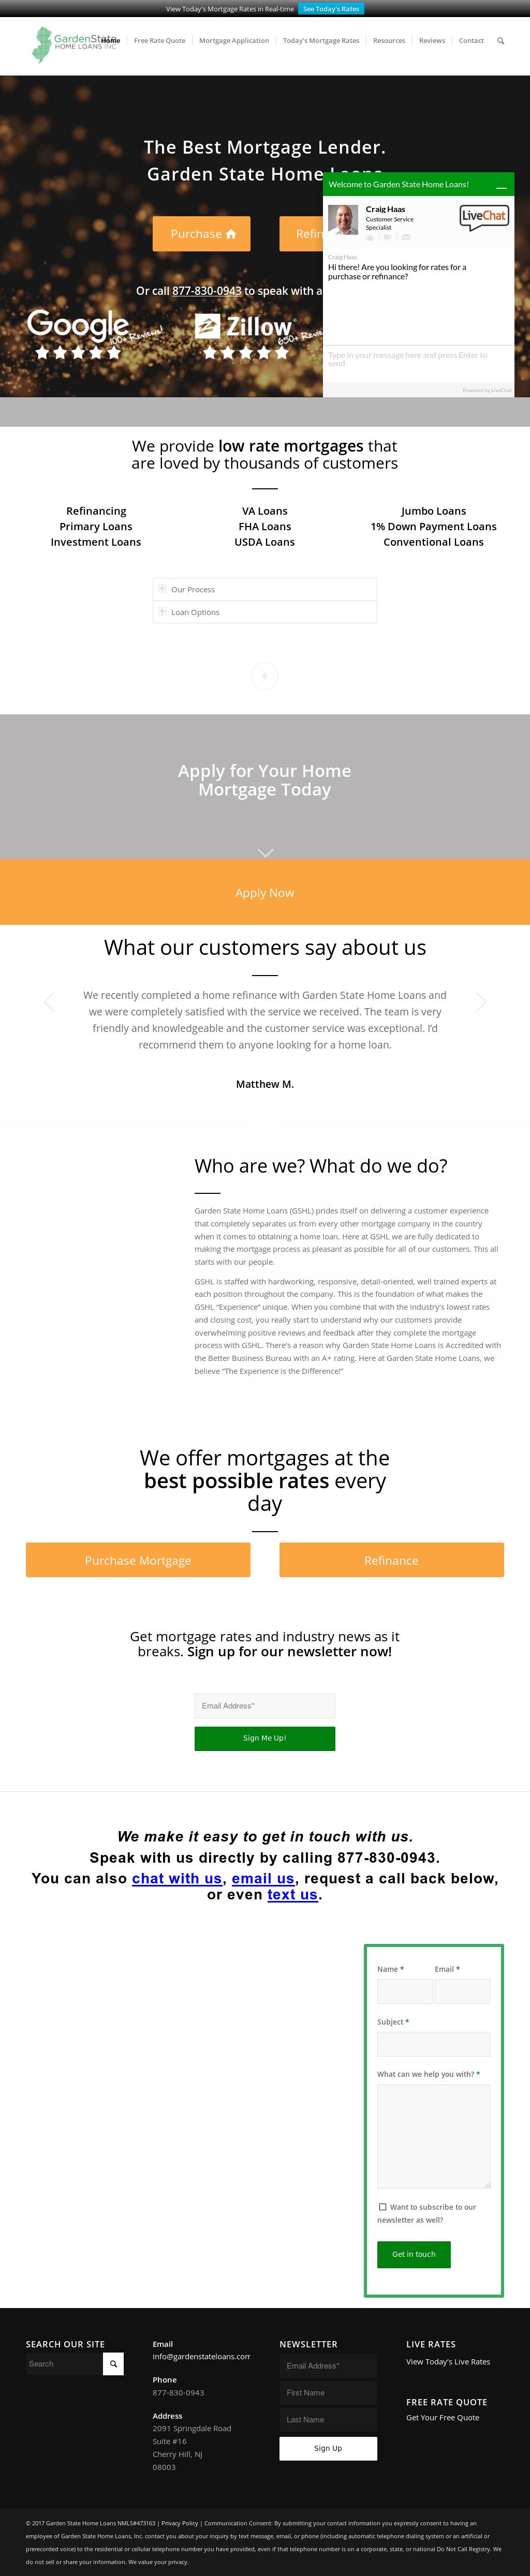 garden state home loans website history - Garden State Home Loans